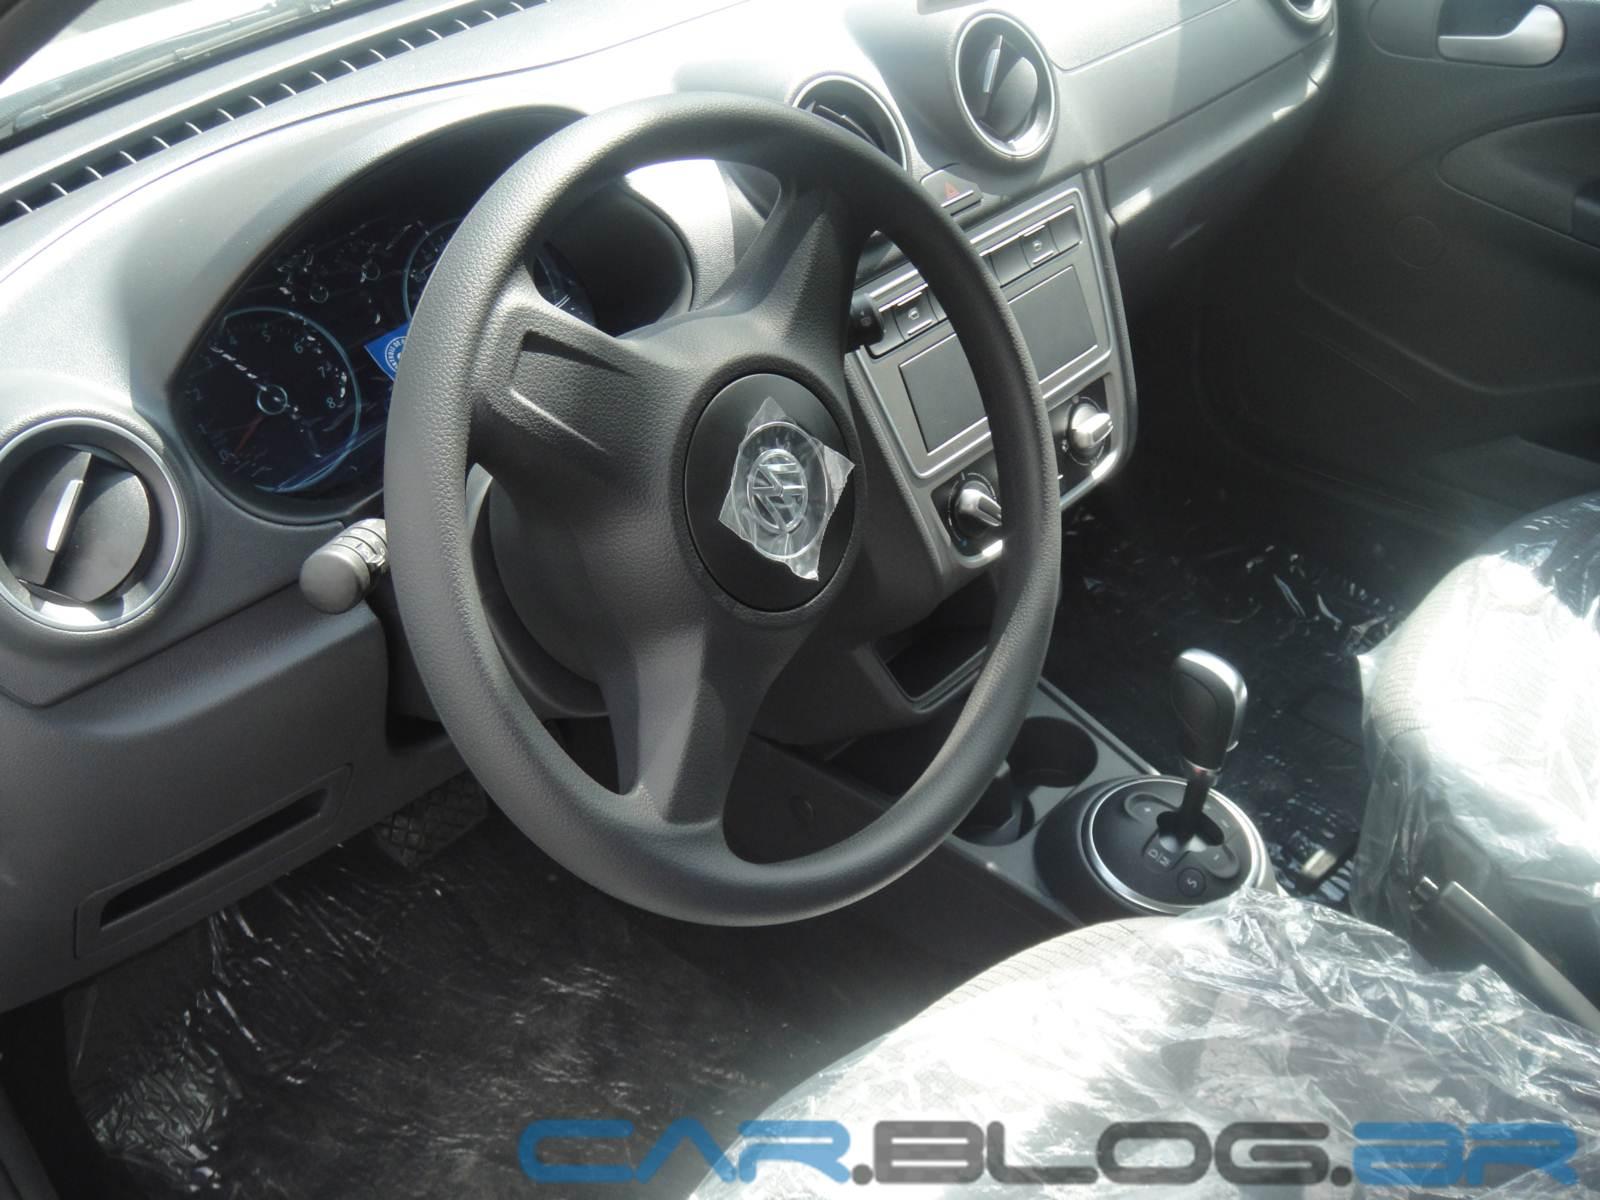 Volkswagen gol g6 problemas e defeitos interior